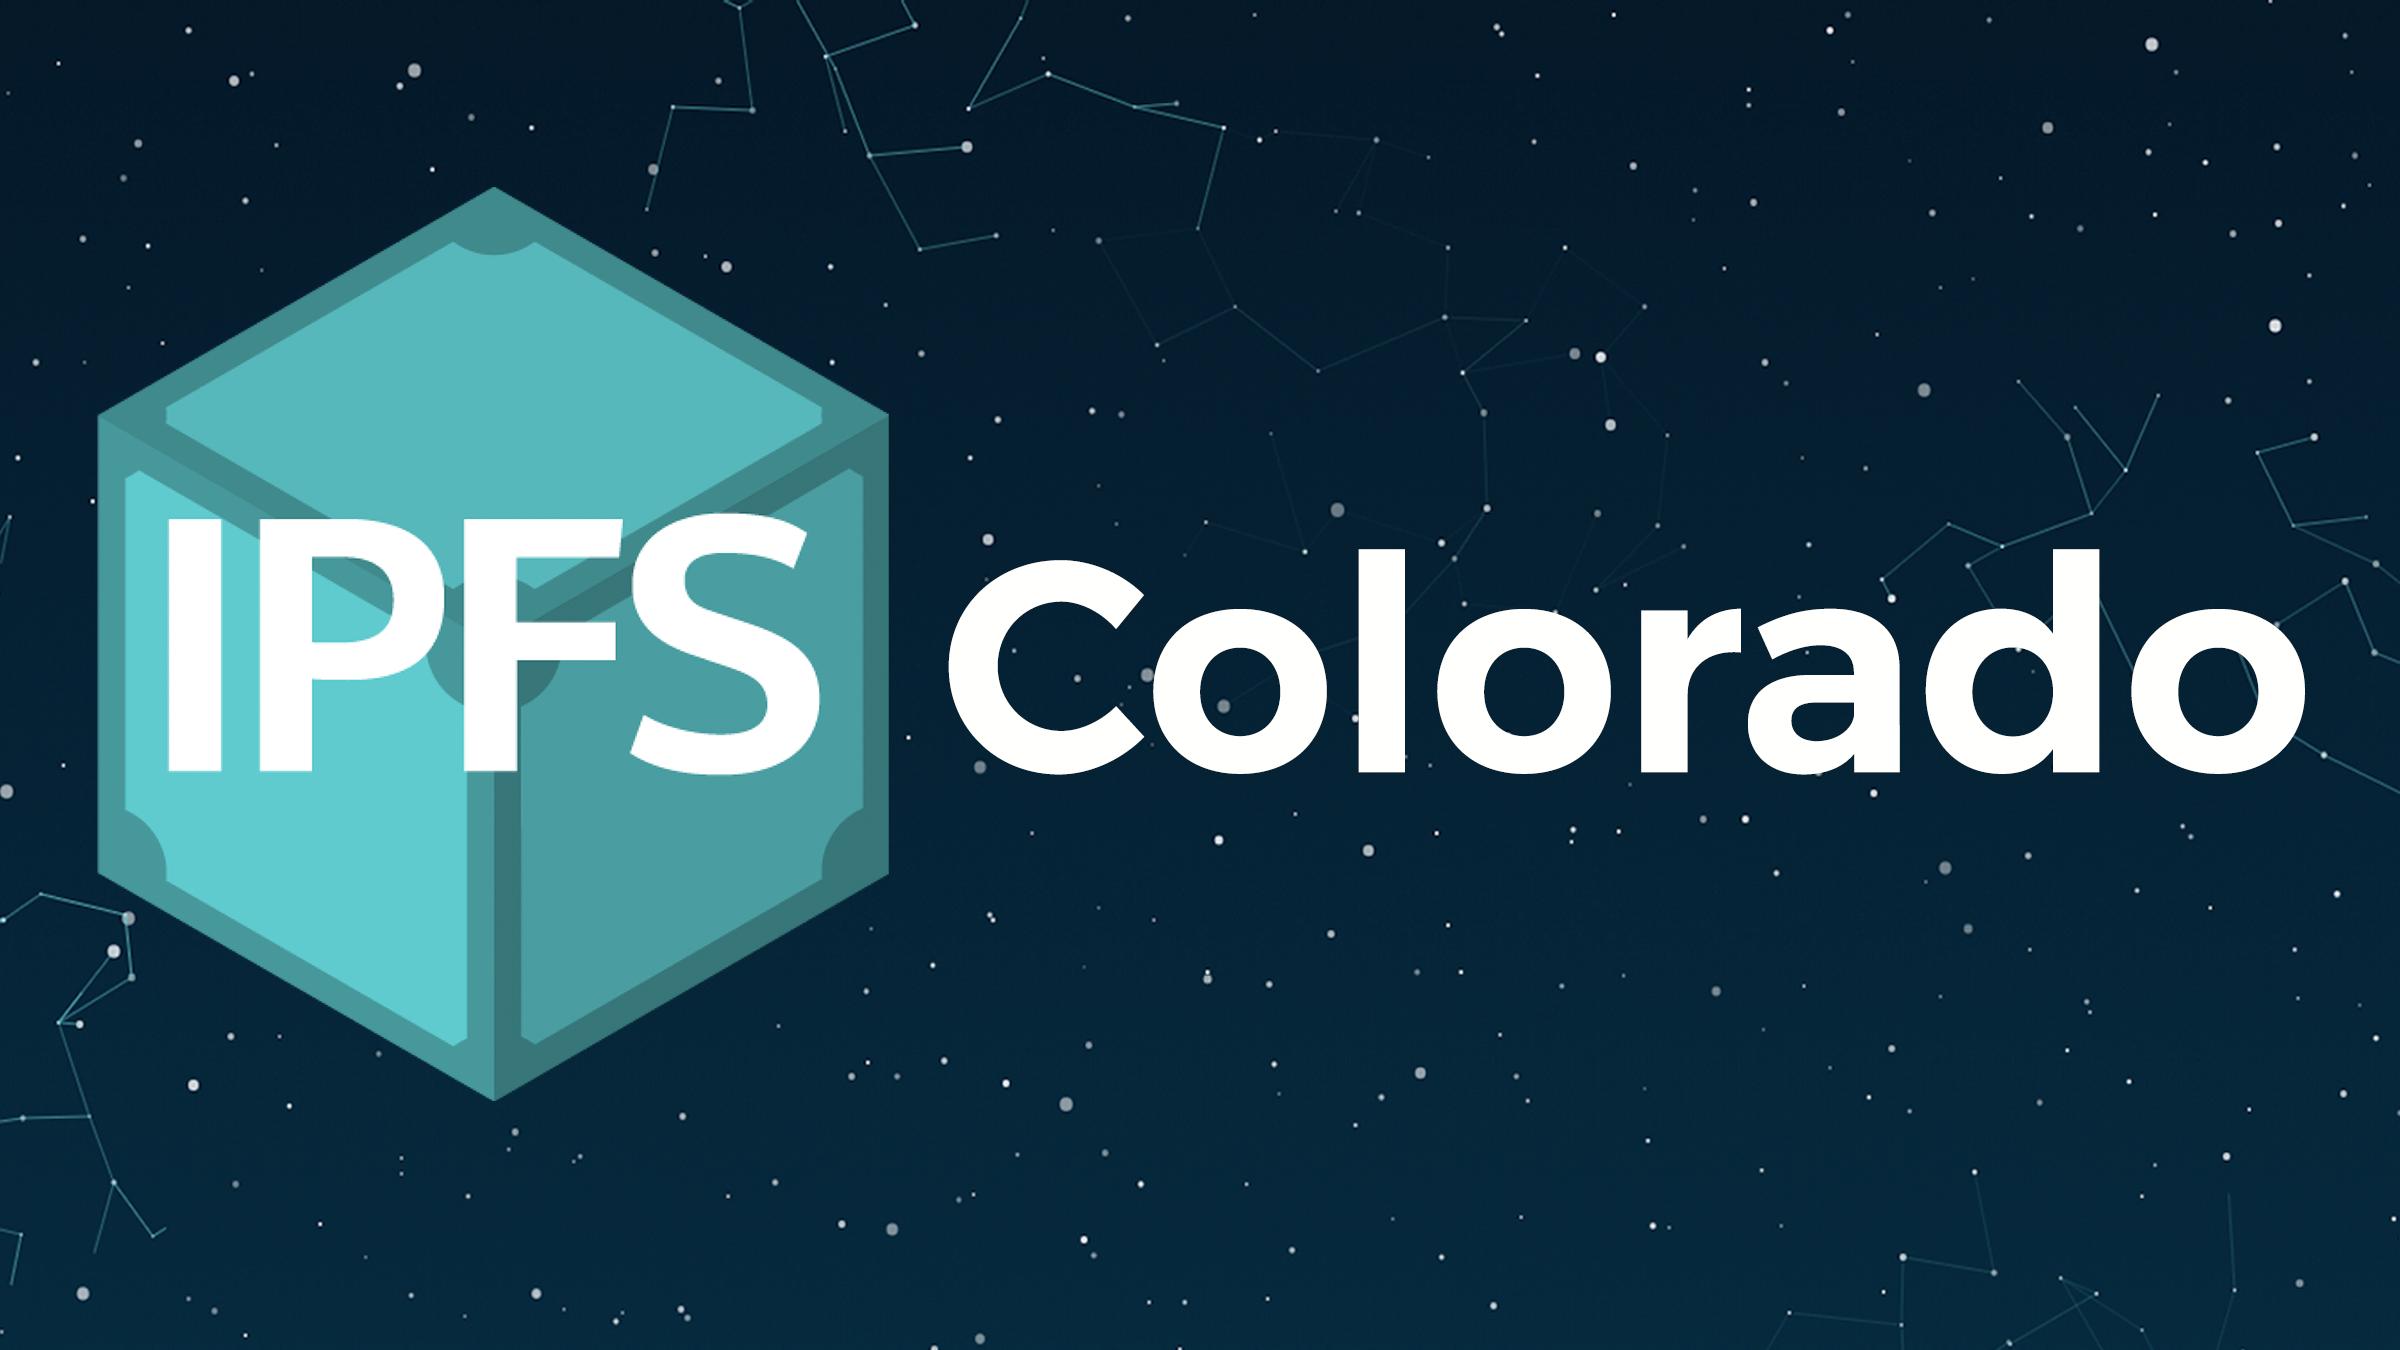 IPFS Colorado